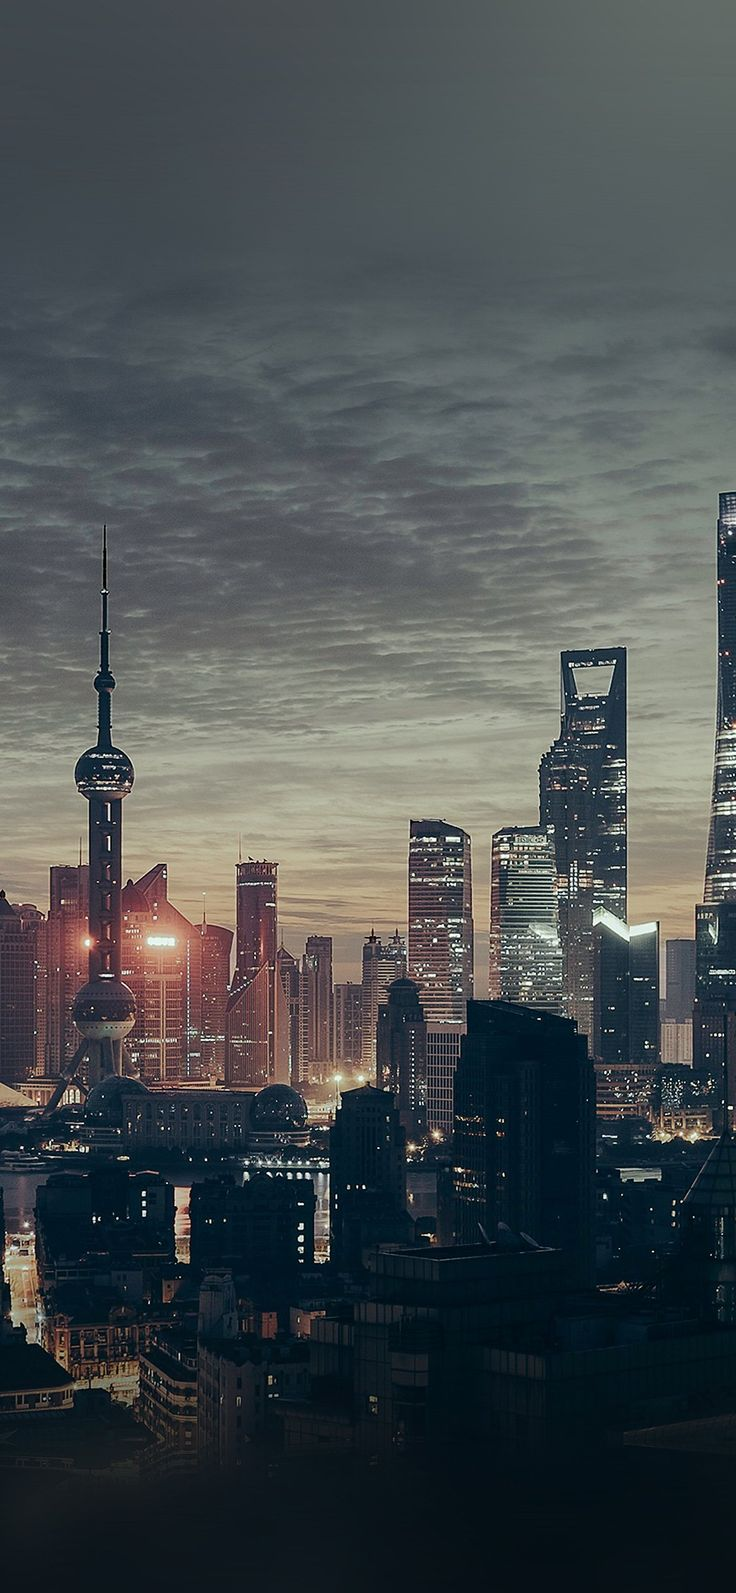 City ShangHai night building skyline iphone x wallpaper